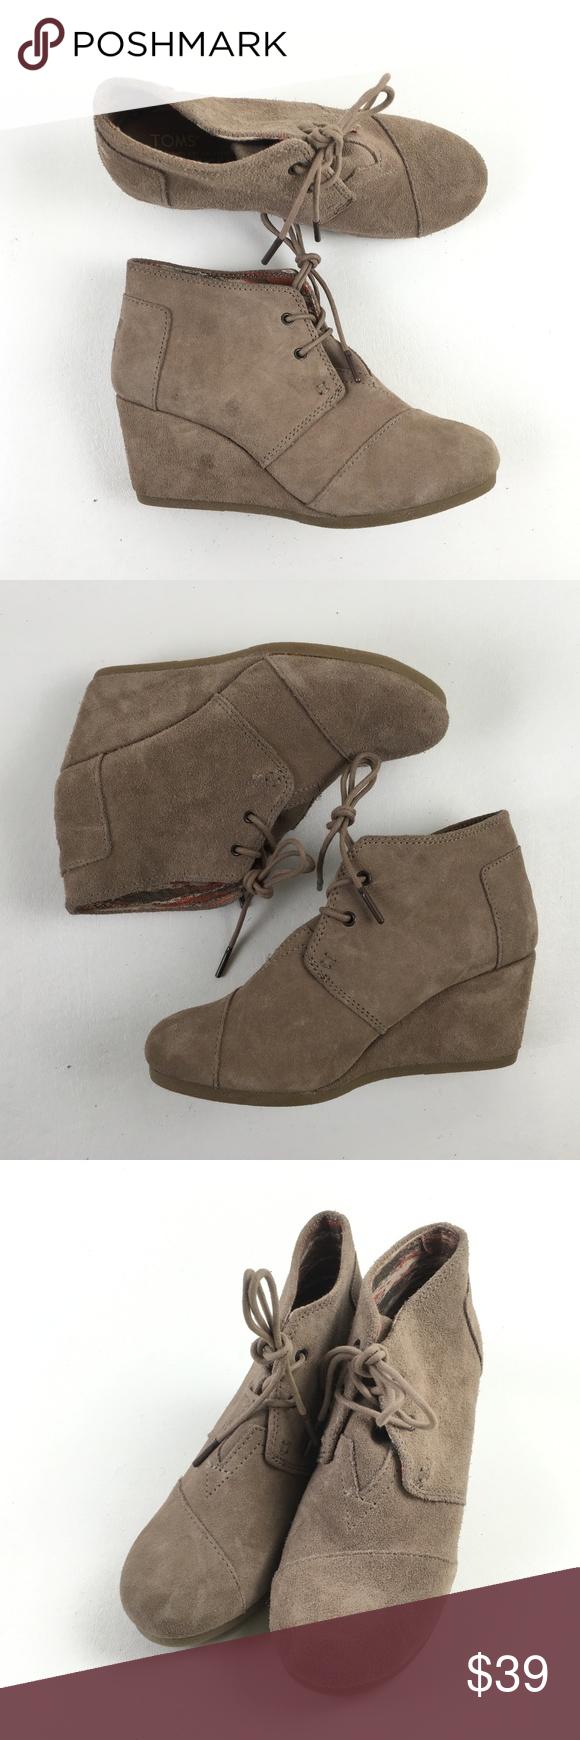 c13de52e9df Toms Sand Desert Wedges X9815764 Toms Womens Sand Cute Booties Boots Shoes Desert  Wedges 6.5 X9815764